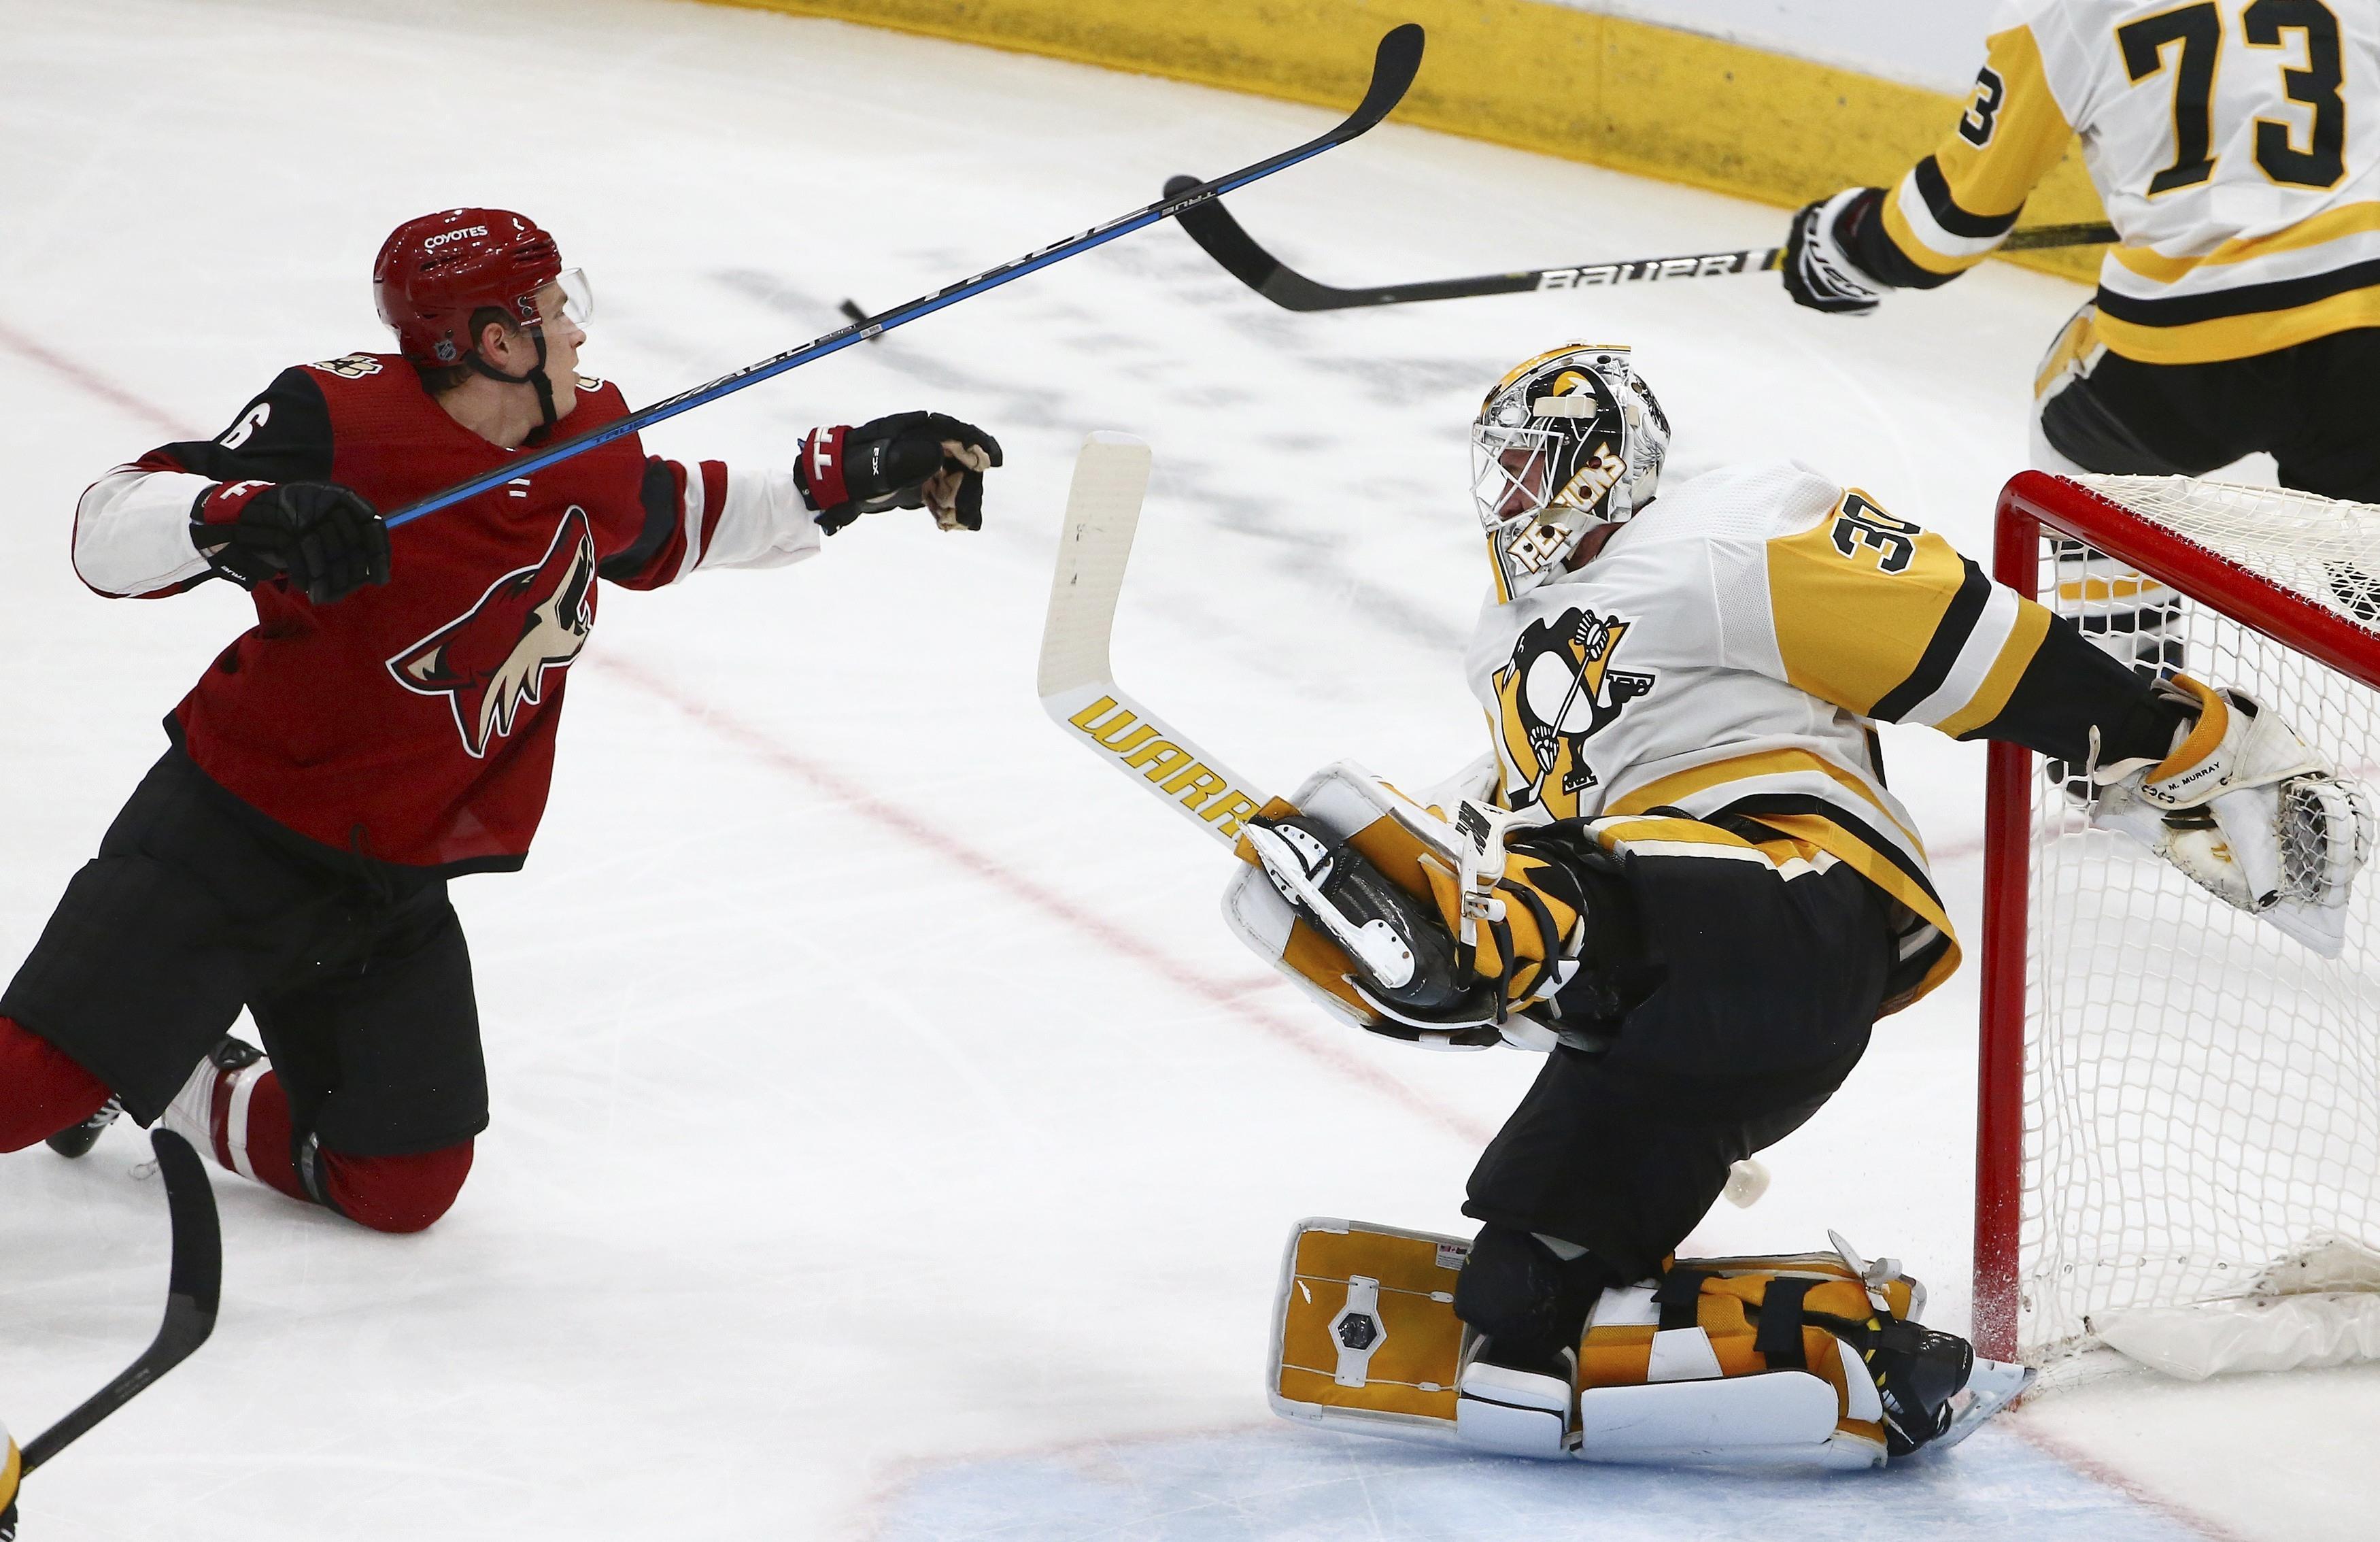 best website 760ed 2084d Kessel scores in overtime, Penguins beat Coyotes 3-2 ...